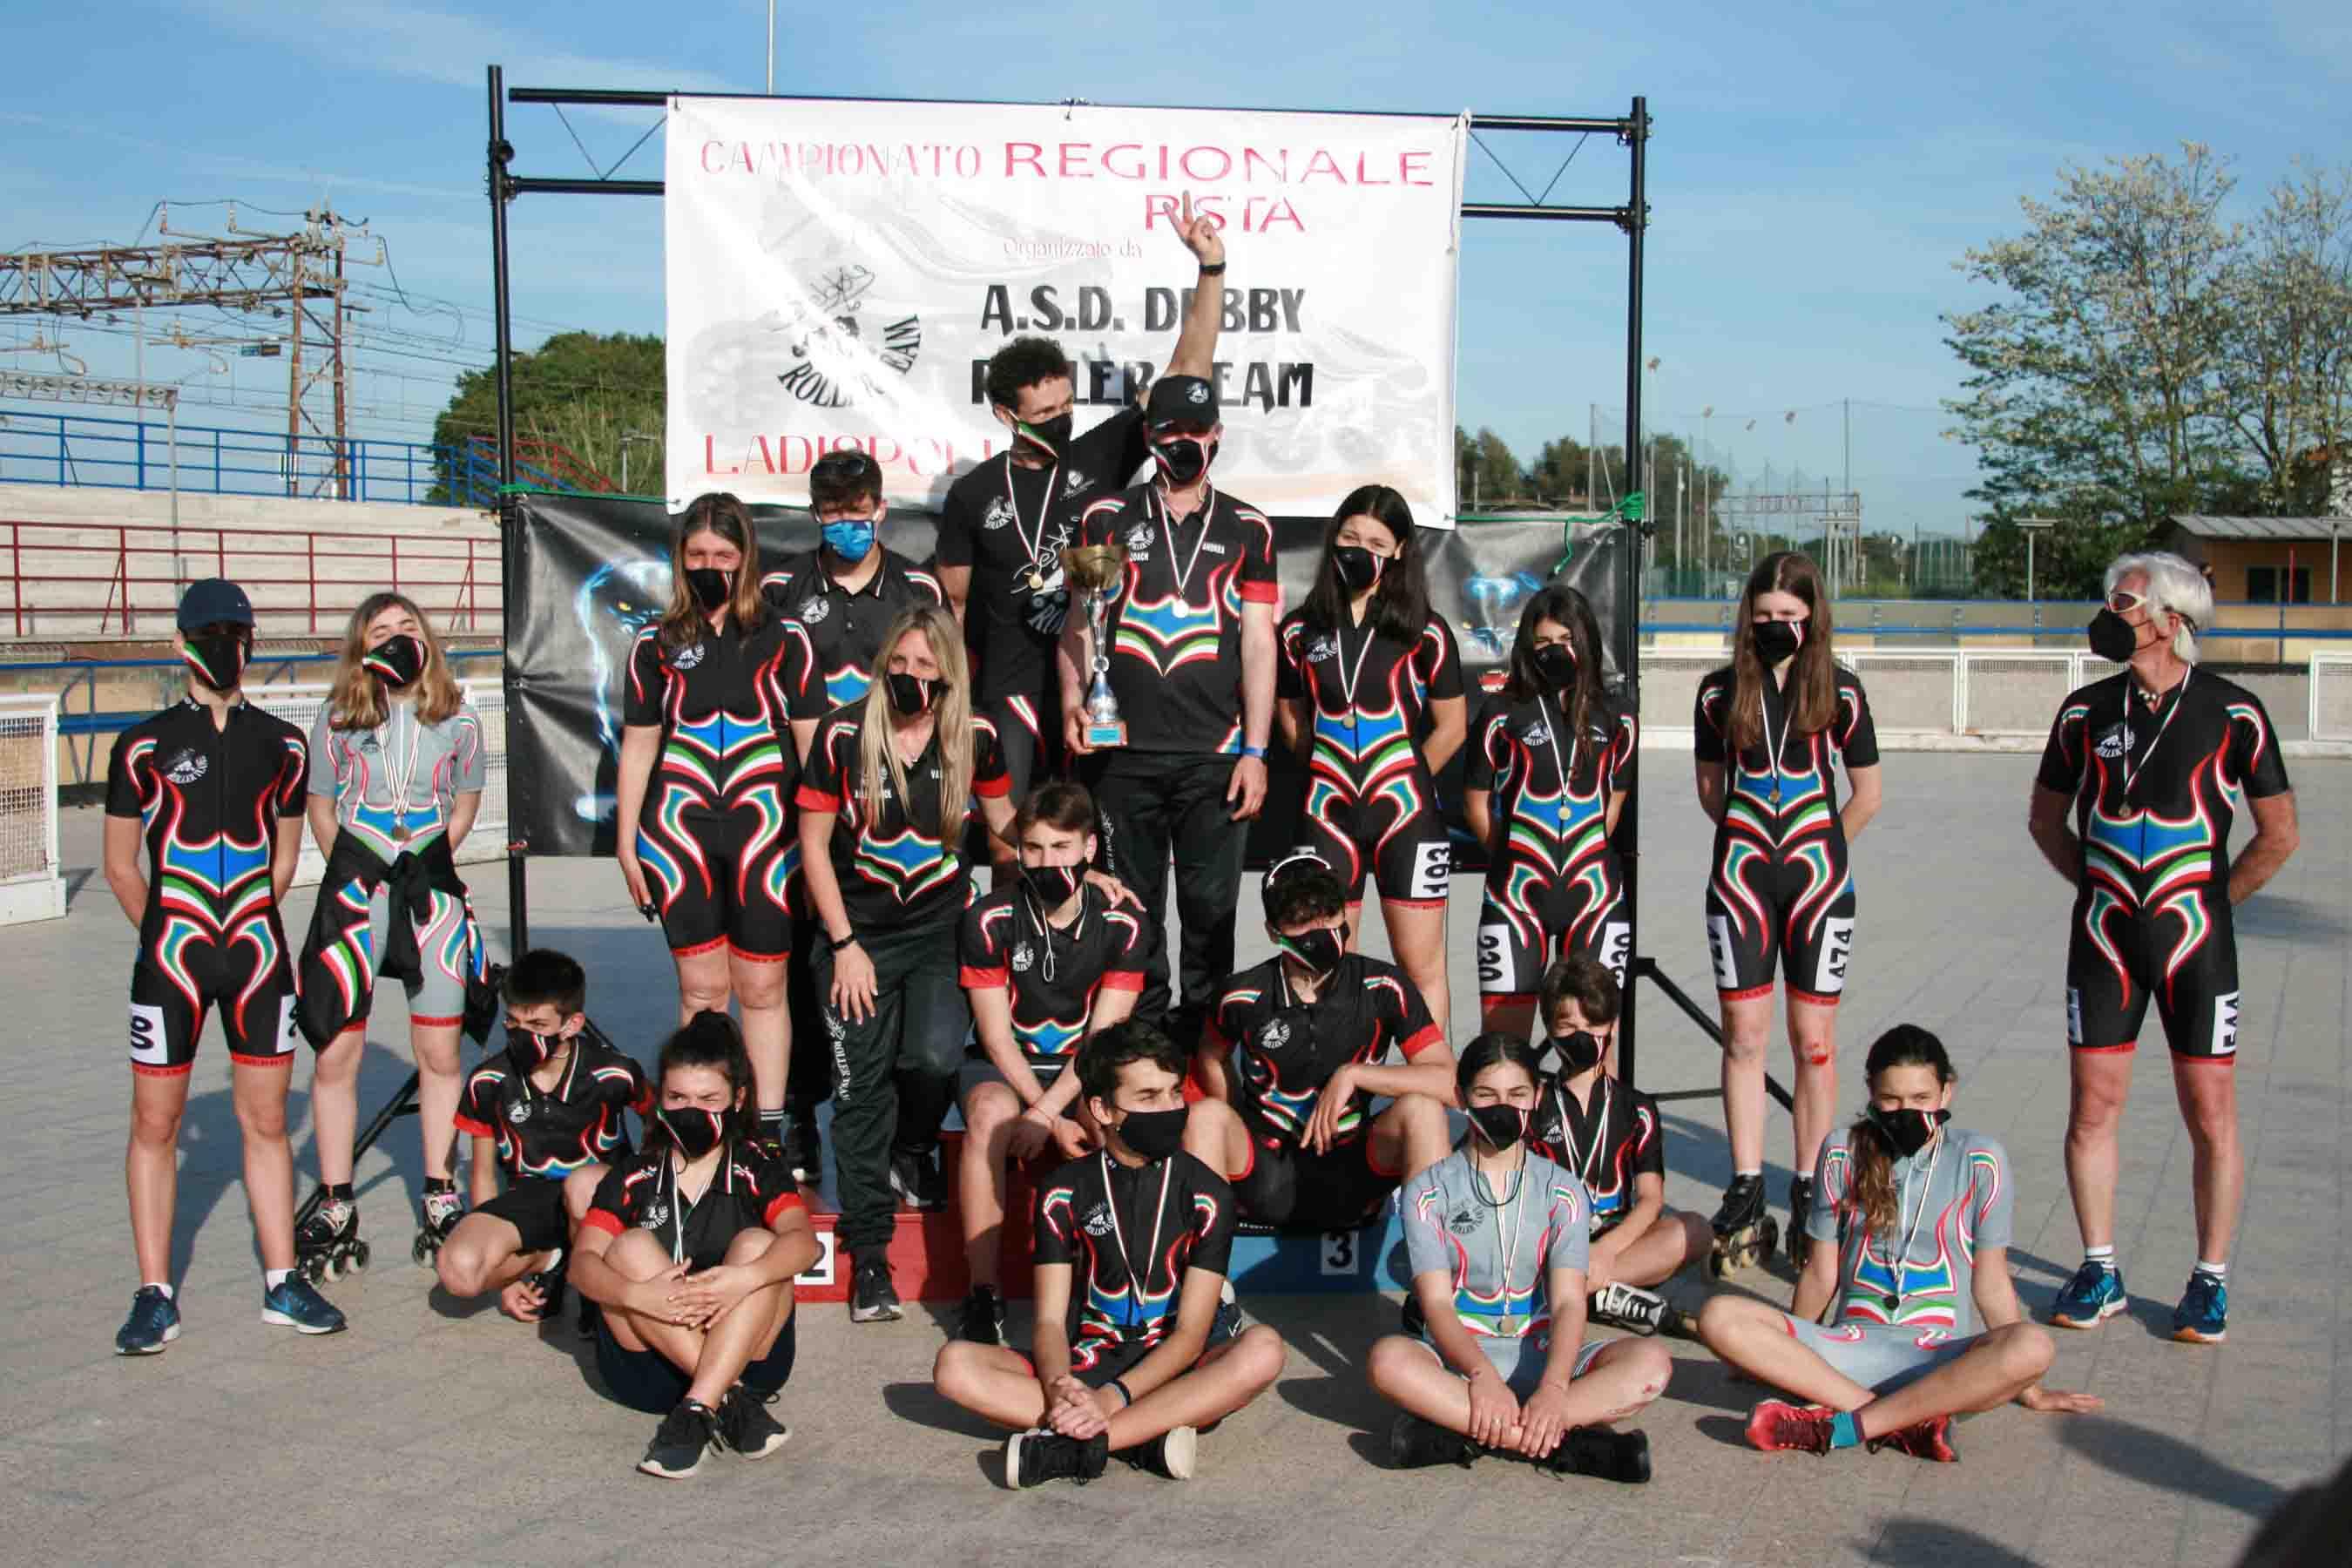 Debby Roller Team, tanti risultati ai campionati regionale Pista 2021